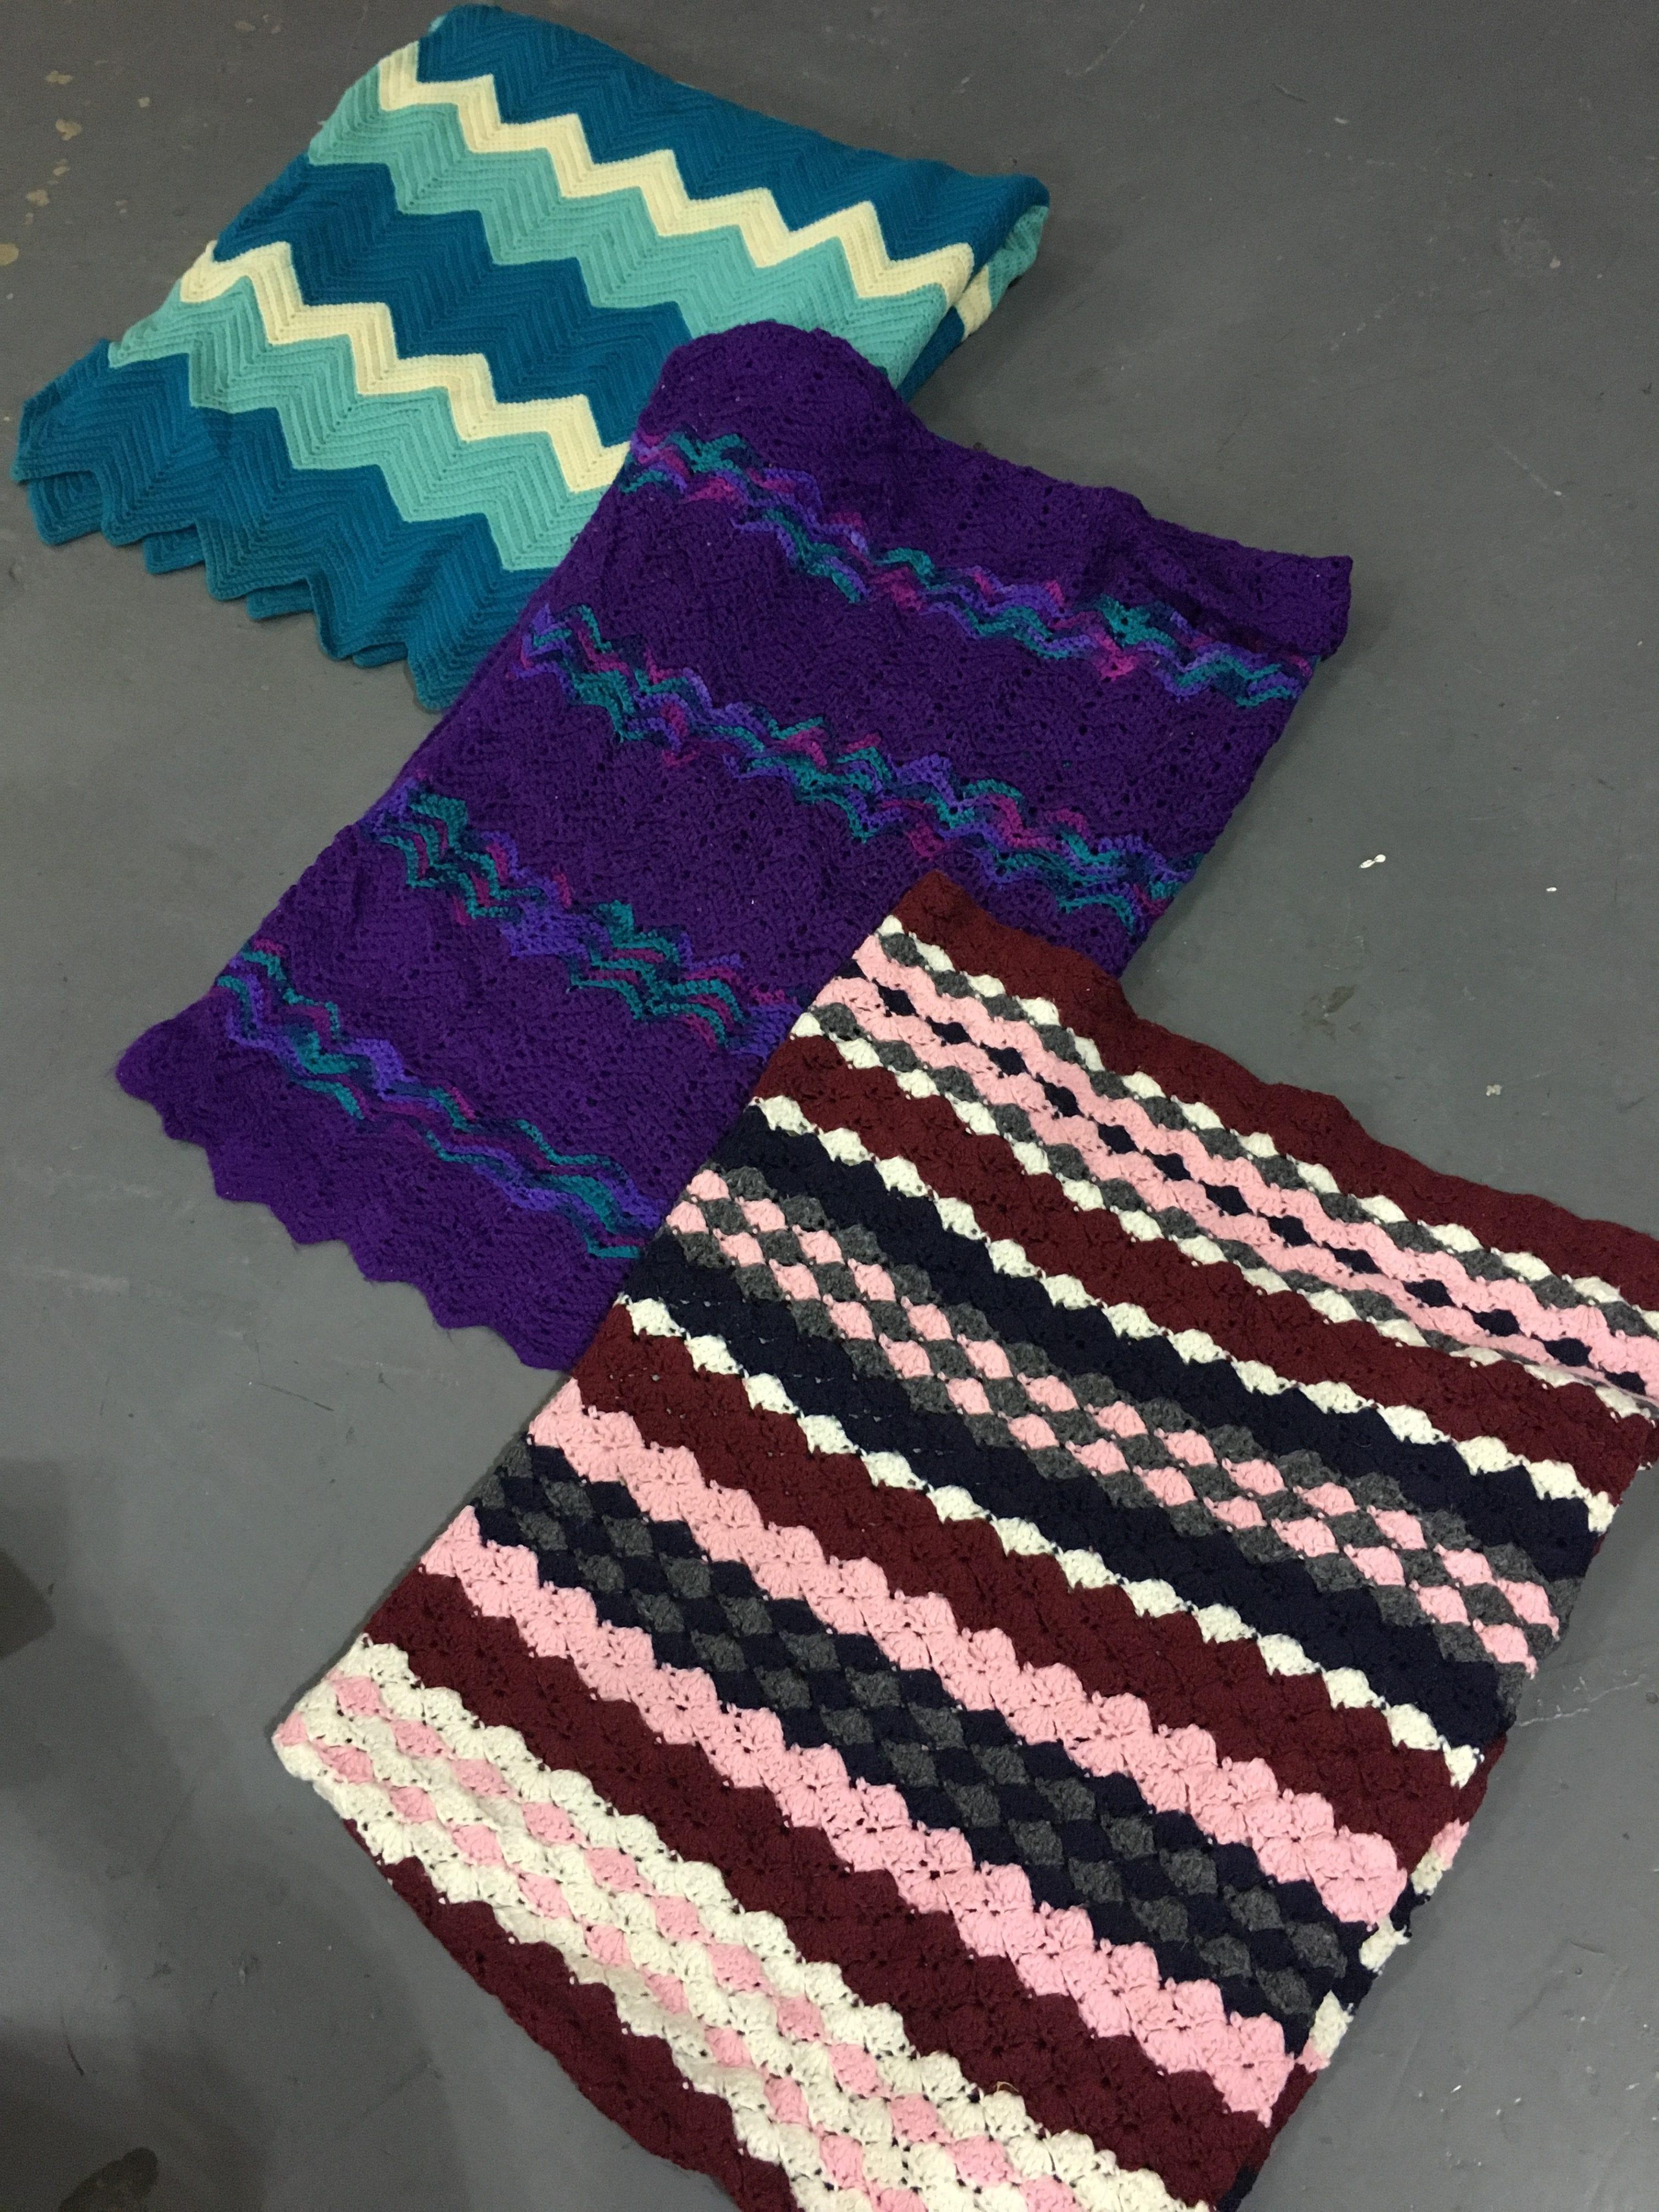 10 x Vintage Blankets